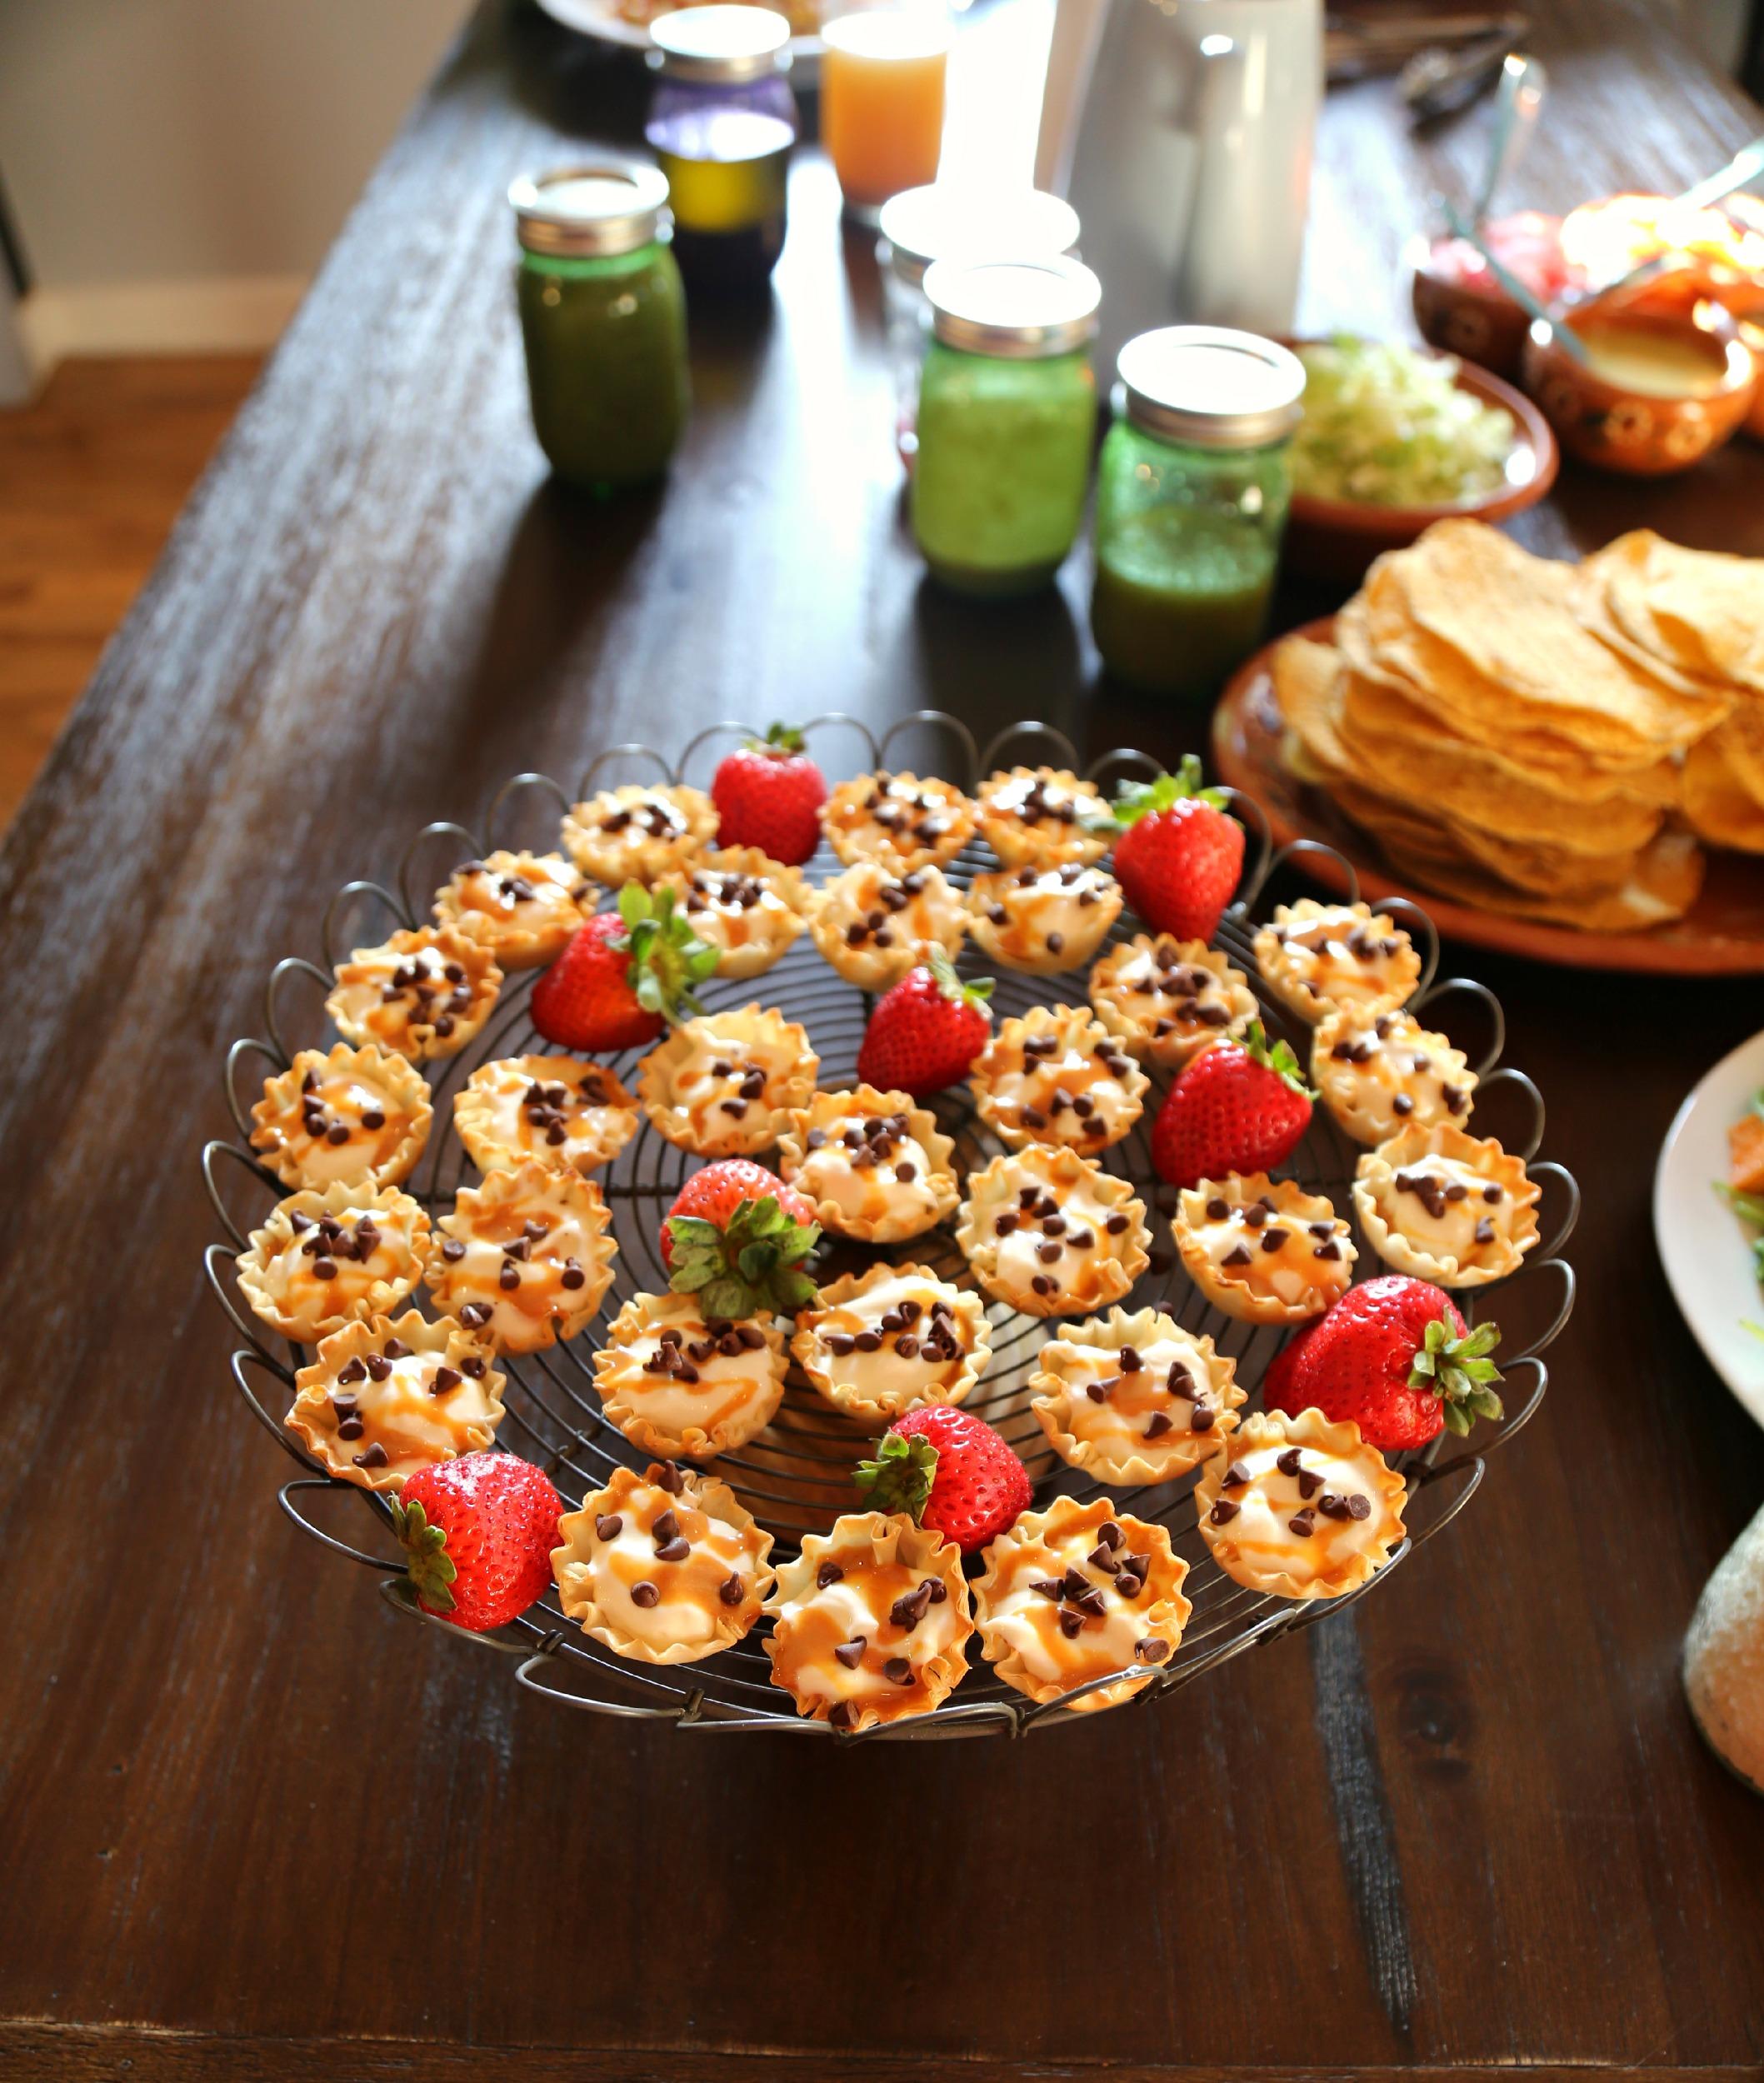 no-bake-mini-cheesecakes-dulce-de-leche-tarts-vianneyrodriguez-sweetlifebake